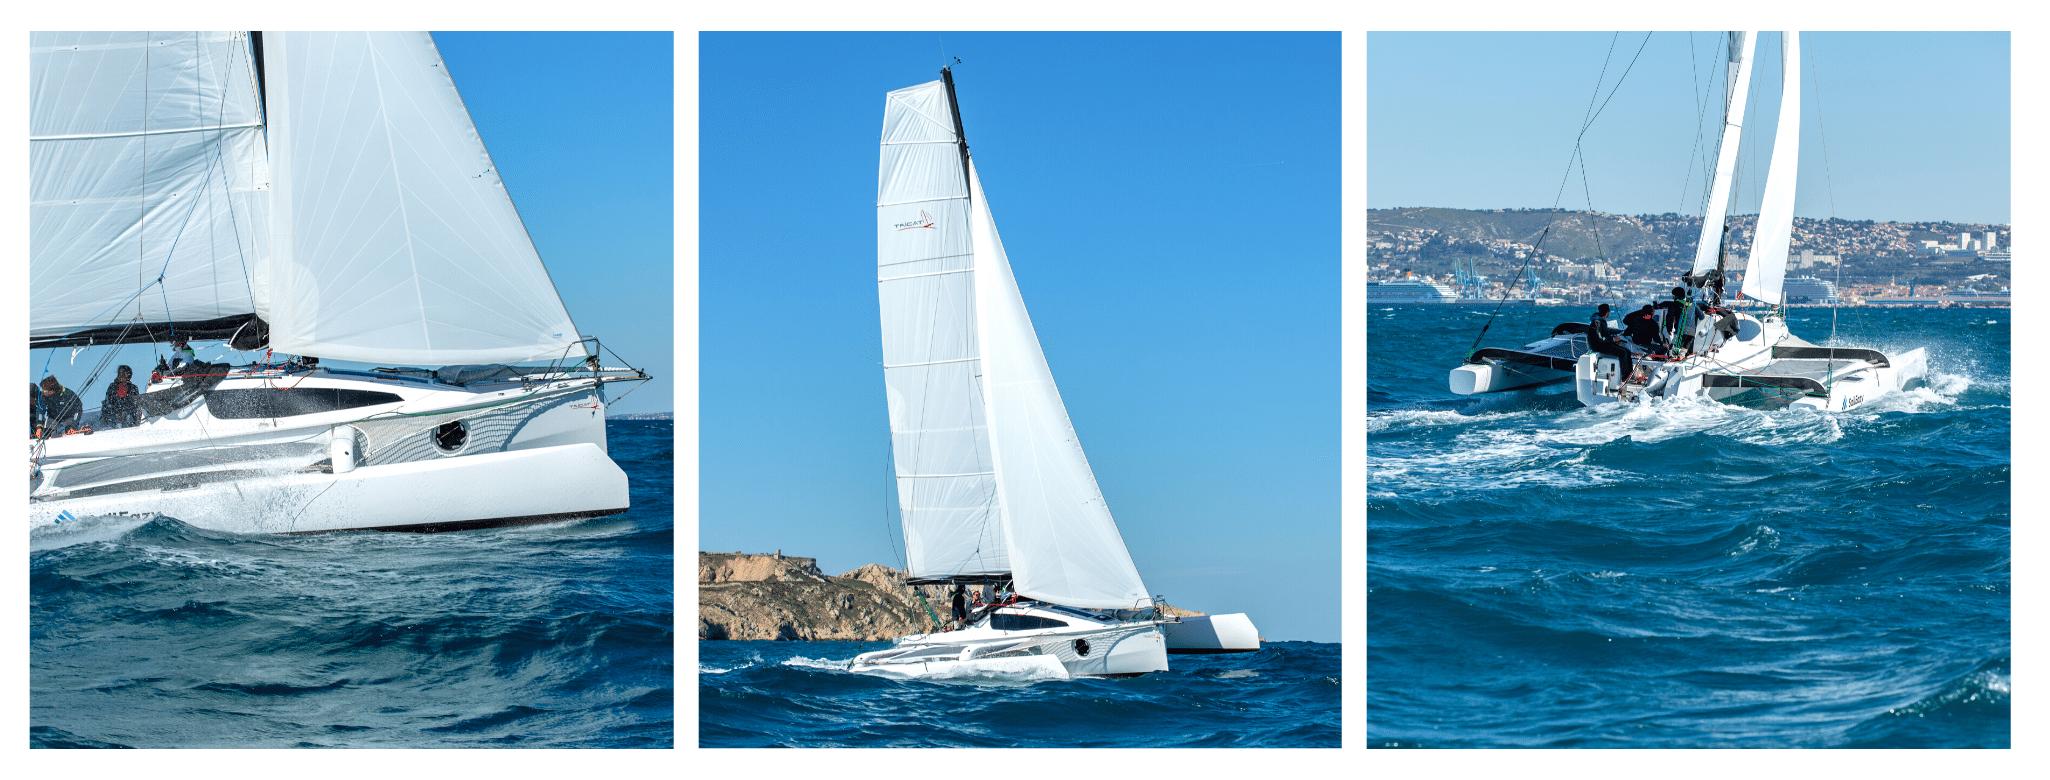 Tricat 30 SailEazy Marseille - Validation Chef de bord Tricat 30 - Marseille